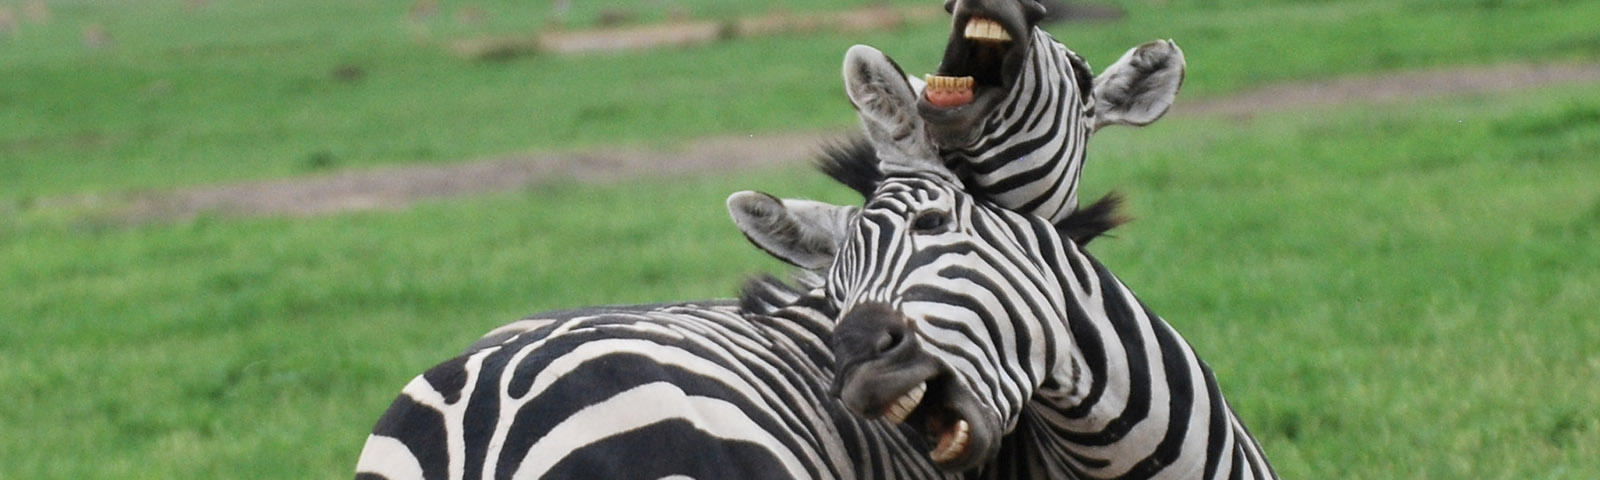 fernandes-zebra-pair